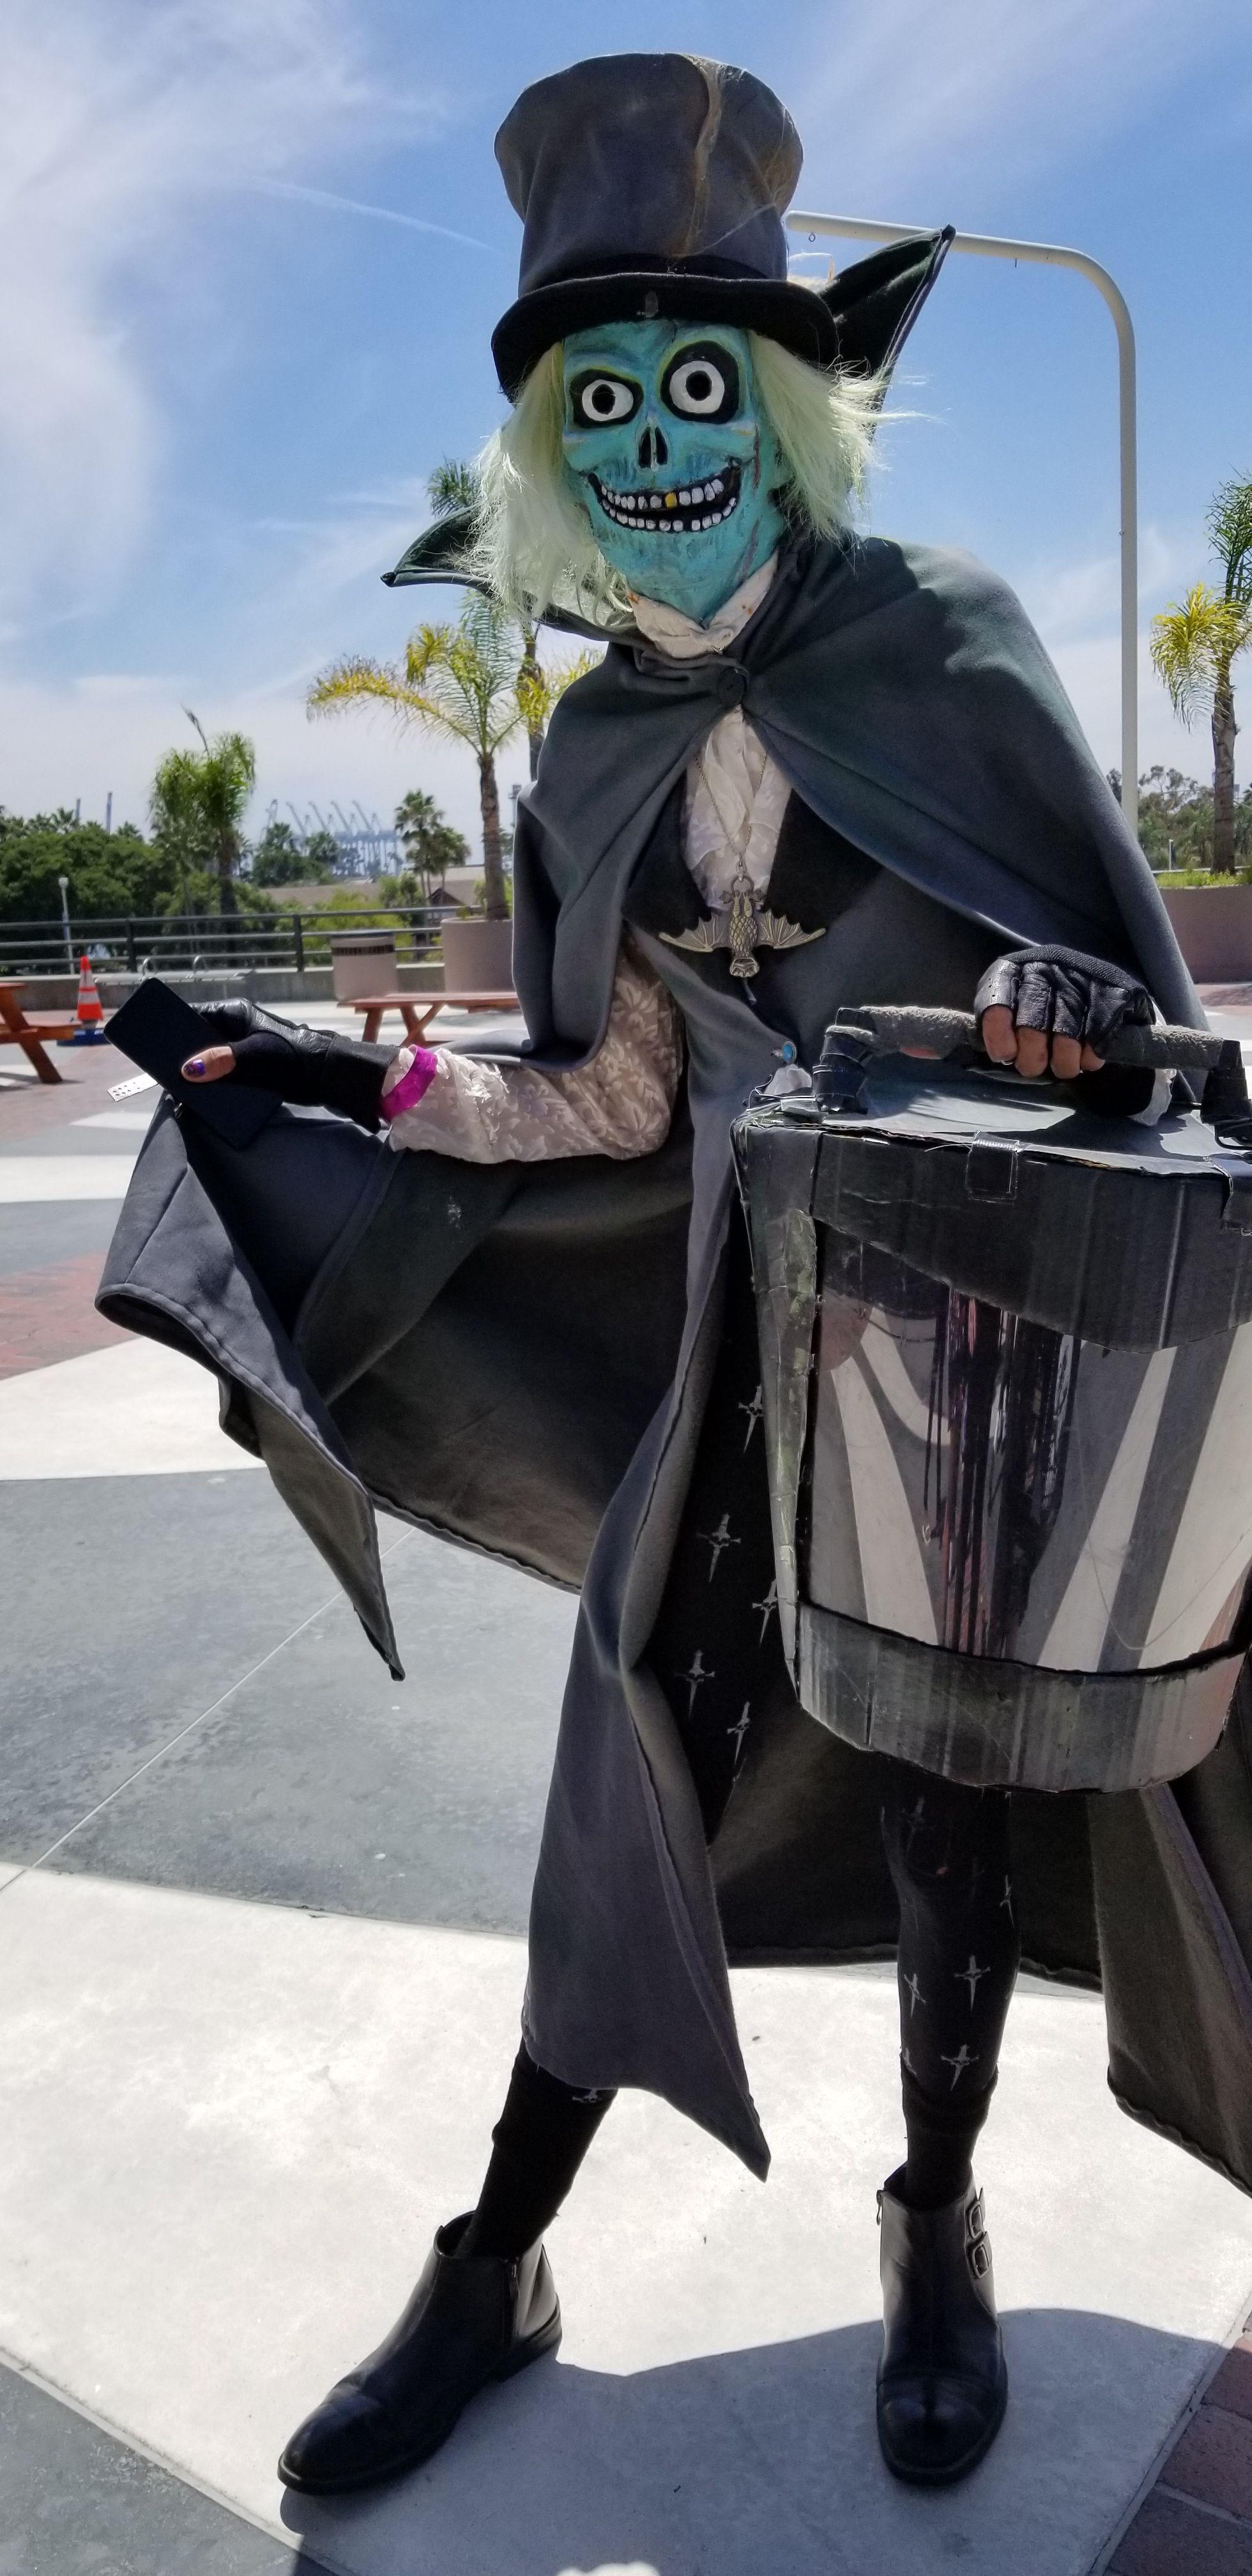 Hatbox Ghost Cosplay At Midsummer Scream 2019 Riding Helmets Hatbox Ghost Cosplay